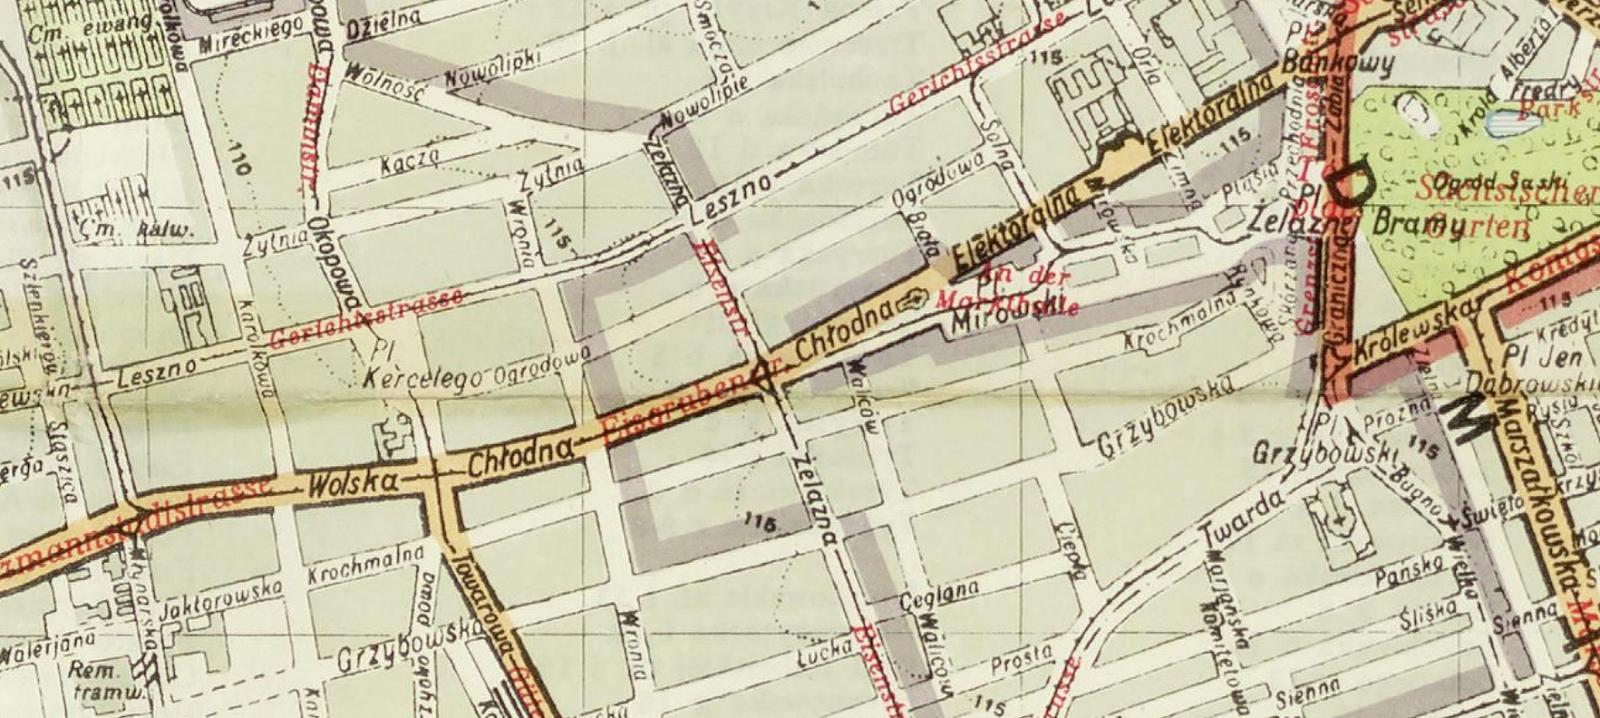 chlodna_mapa_fragment_1940_niem.png [2.78 MB]